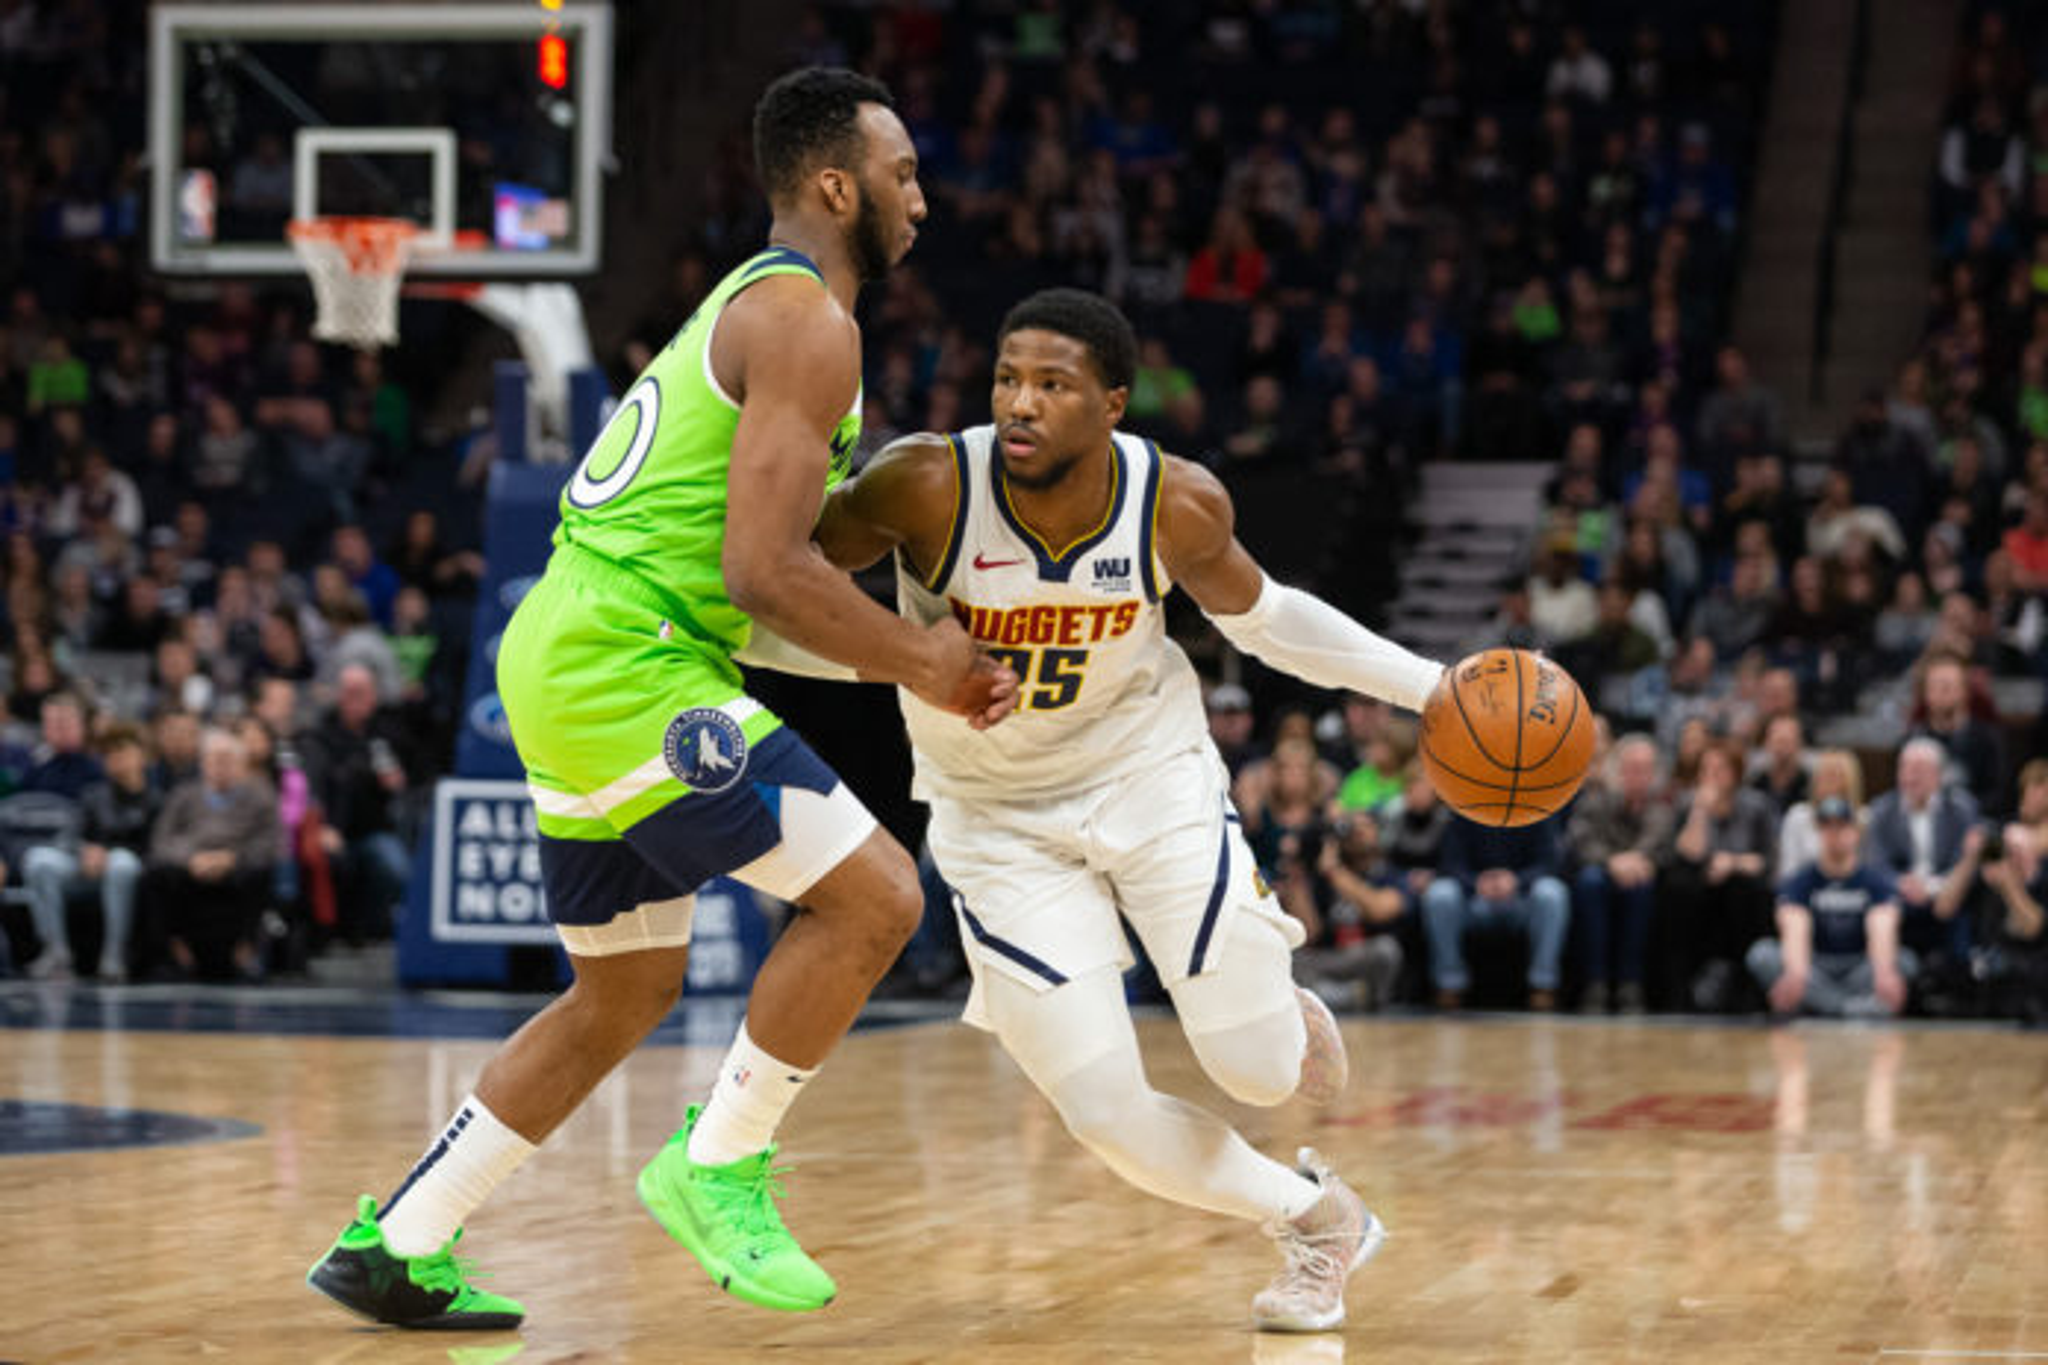 Denver Nuggets guard Malik Beasley (25) dribbles the ball as Minnesota Timberwolves guard Josh Okogie (20) guards him during the first quarter at Target Center.